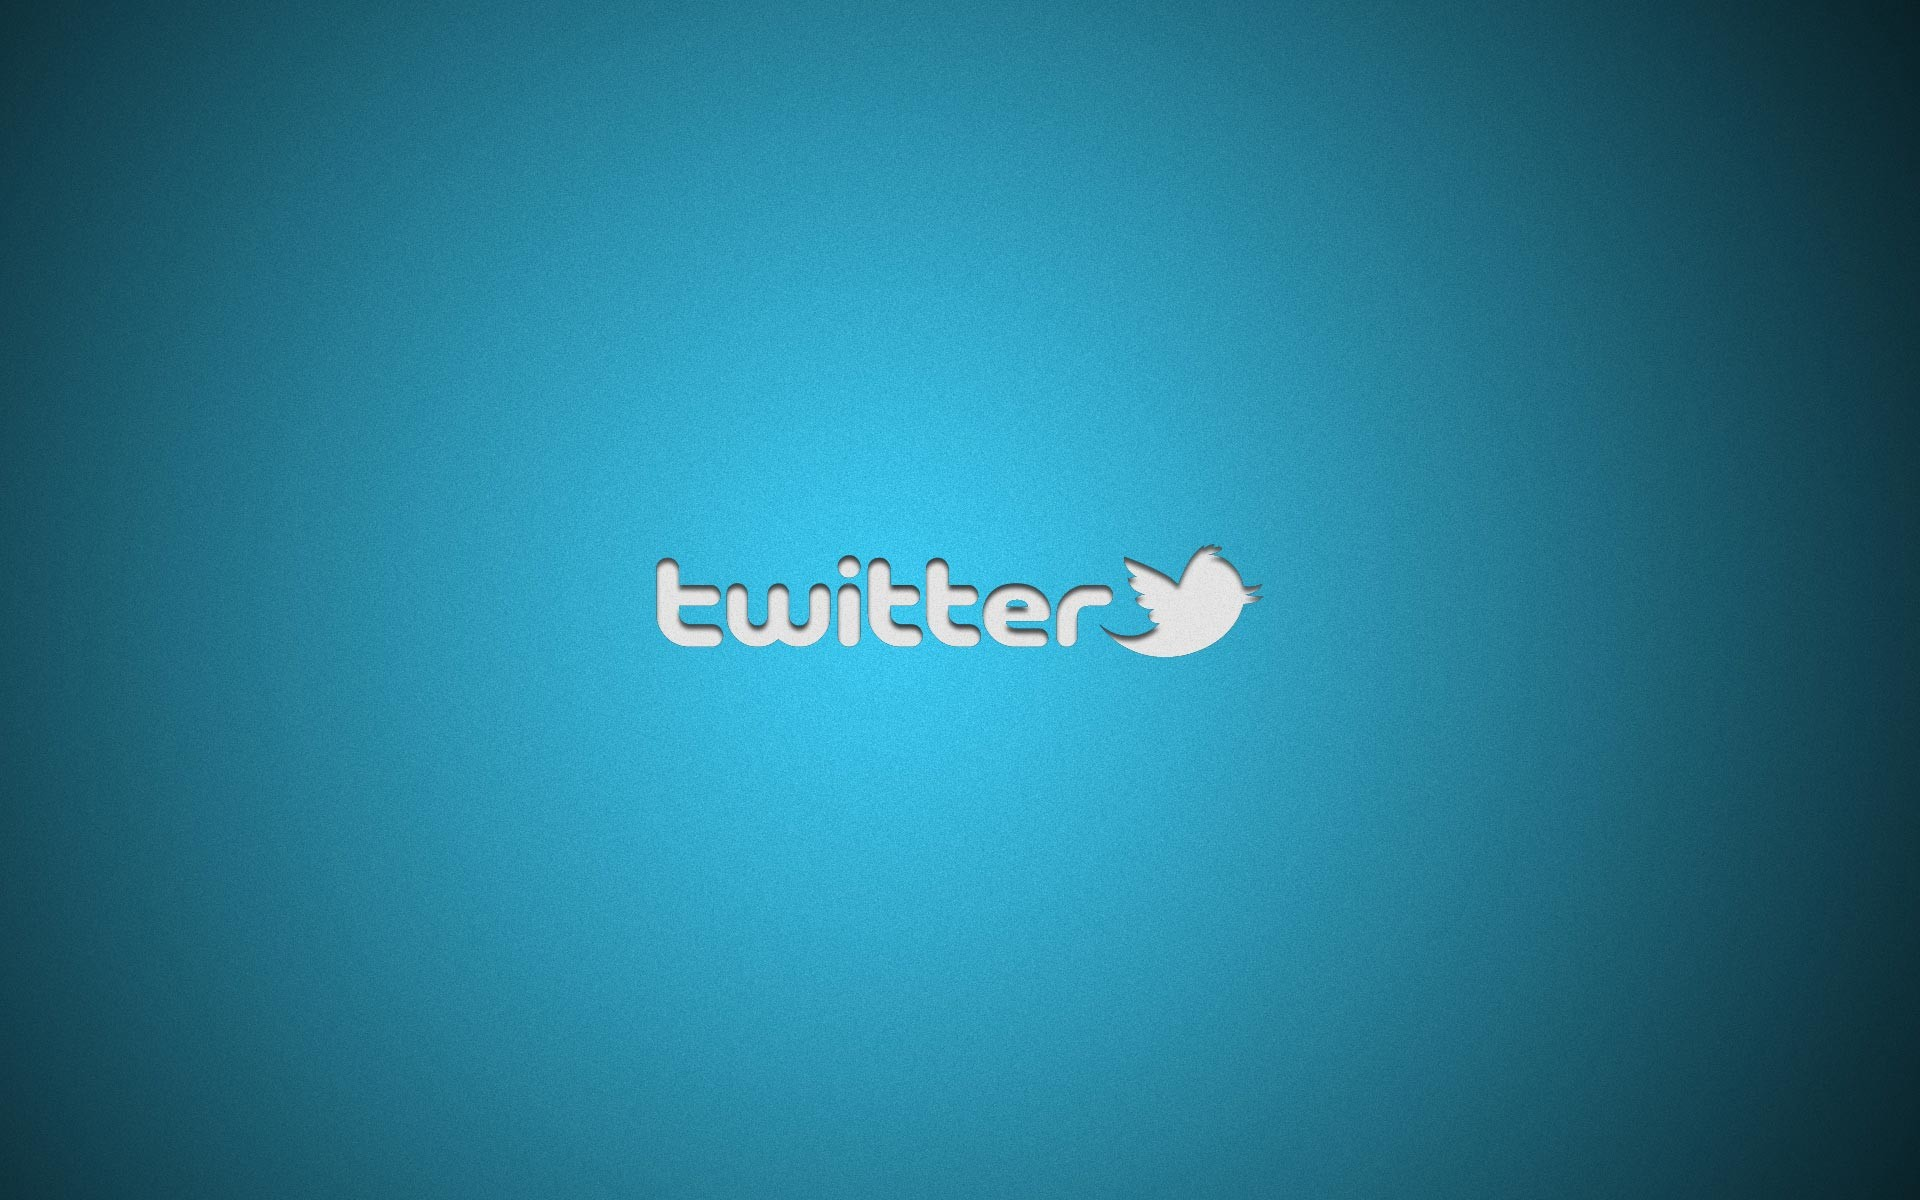 Twitter Logo Wallpaper